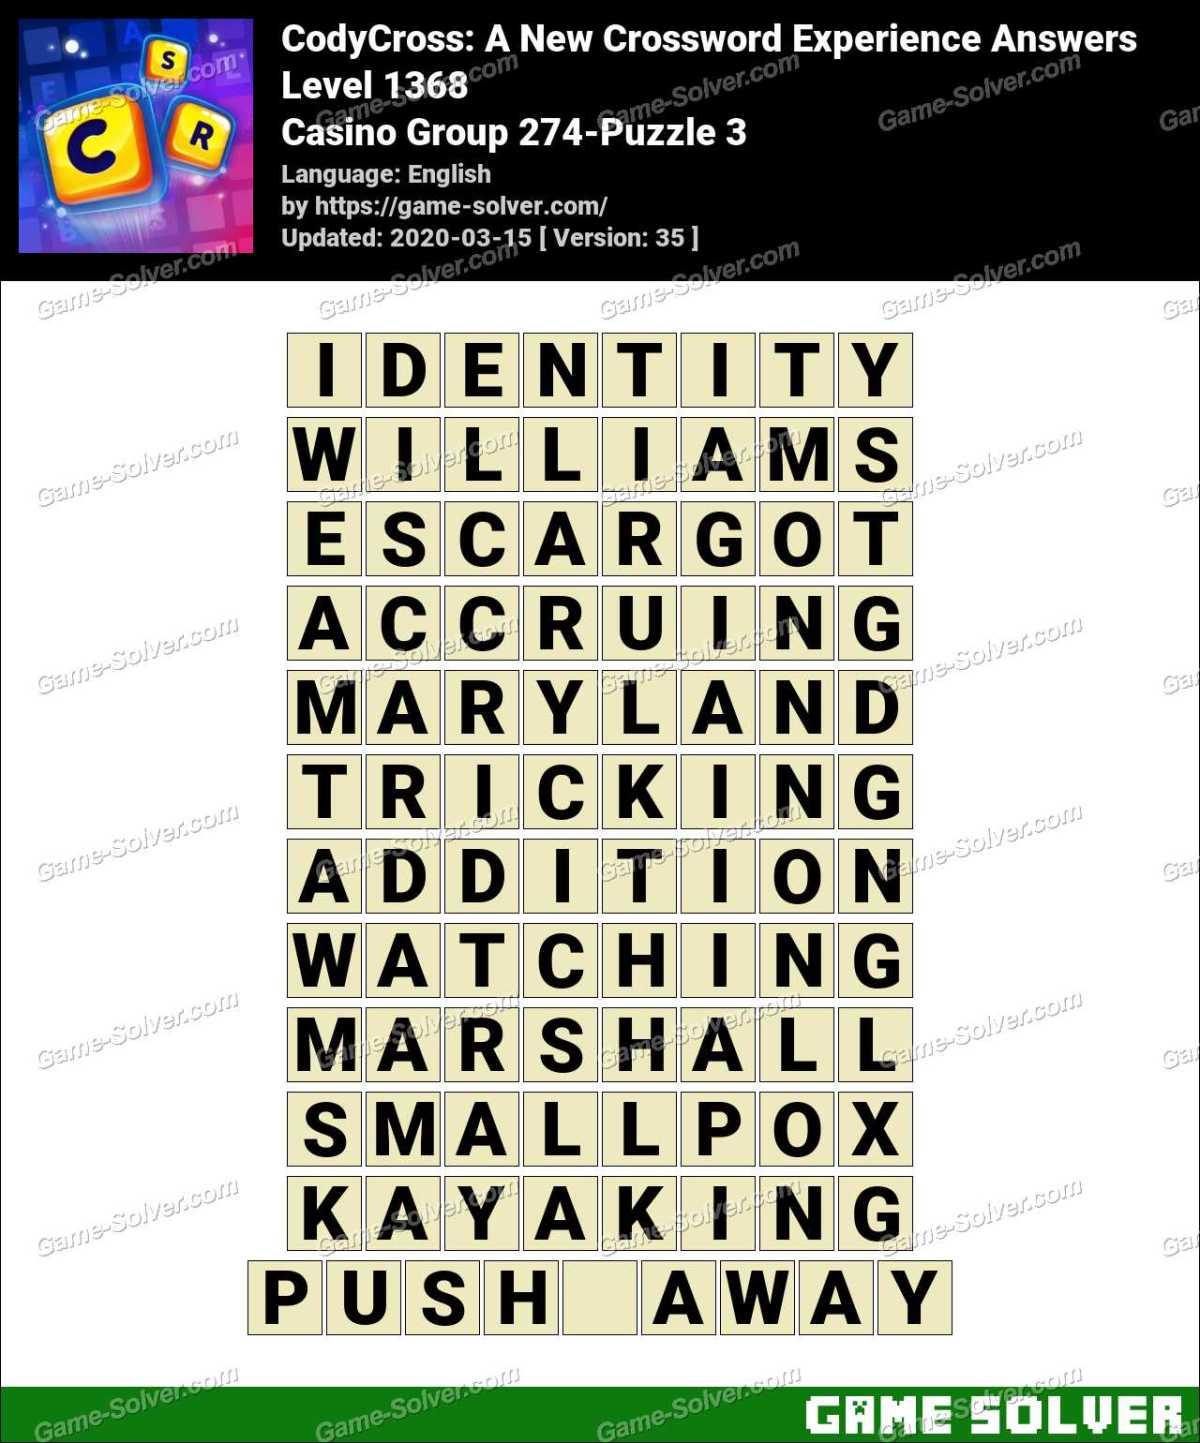 CodyCross Casino Group 274-Puzzle 3 Answers